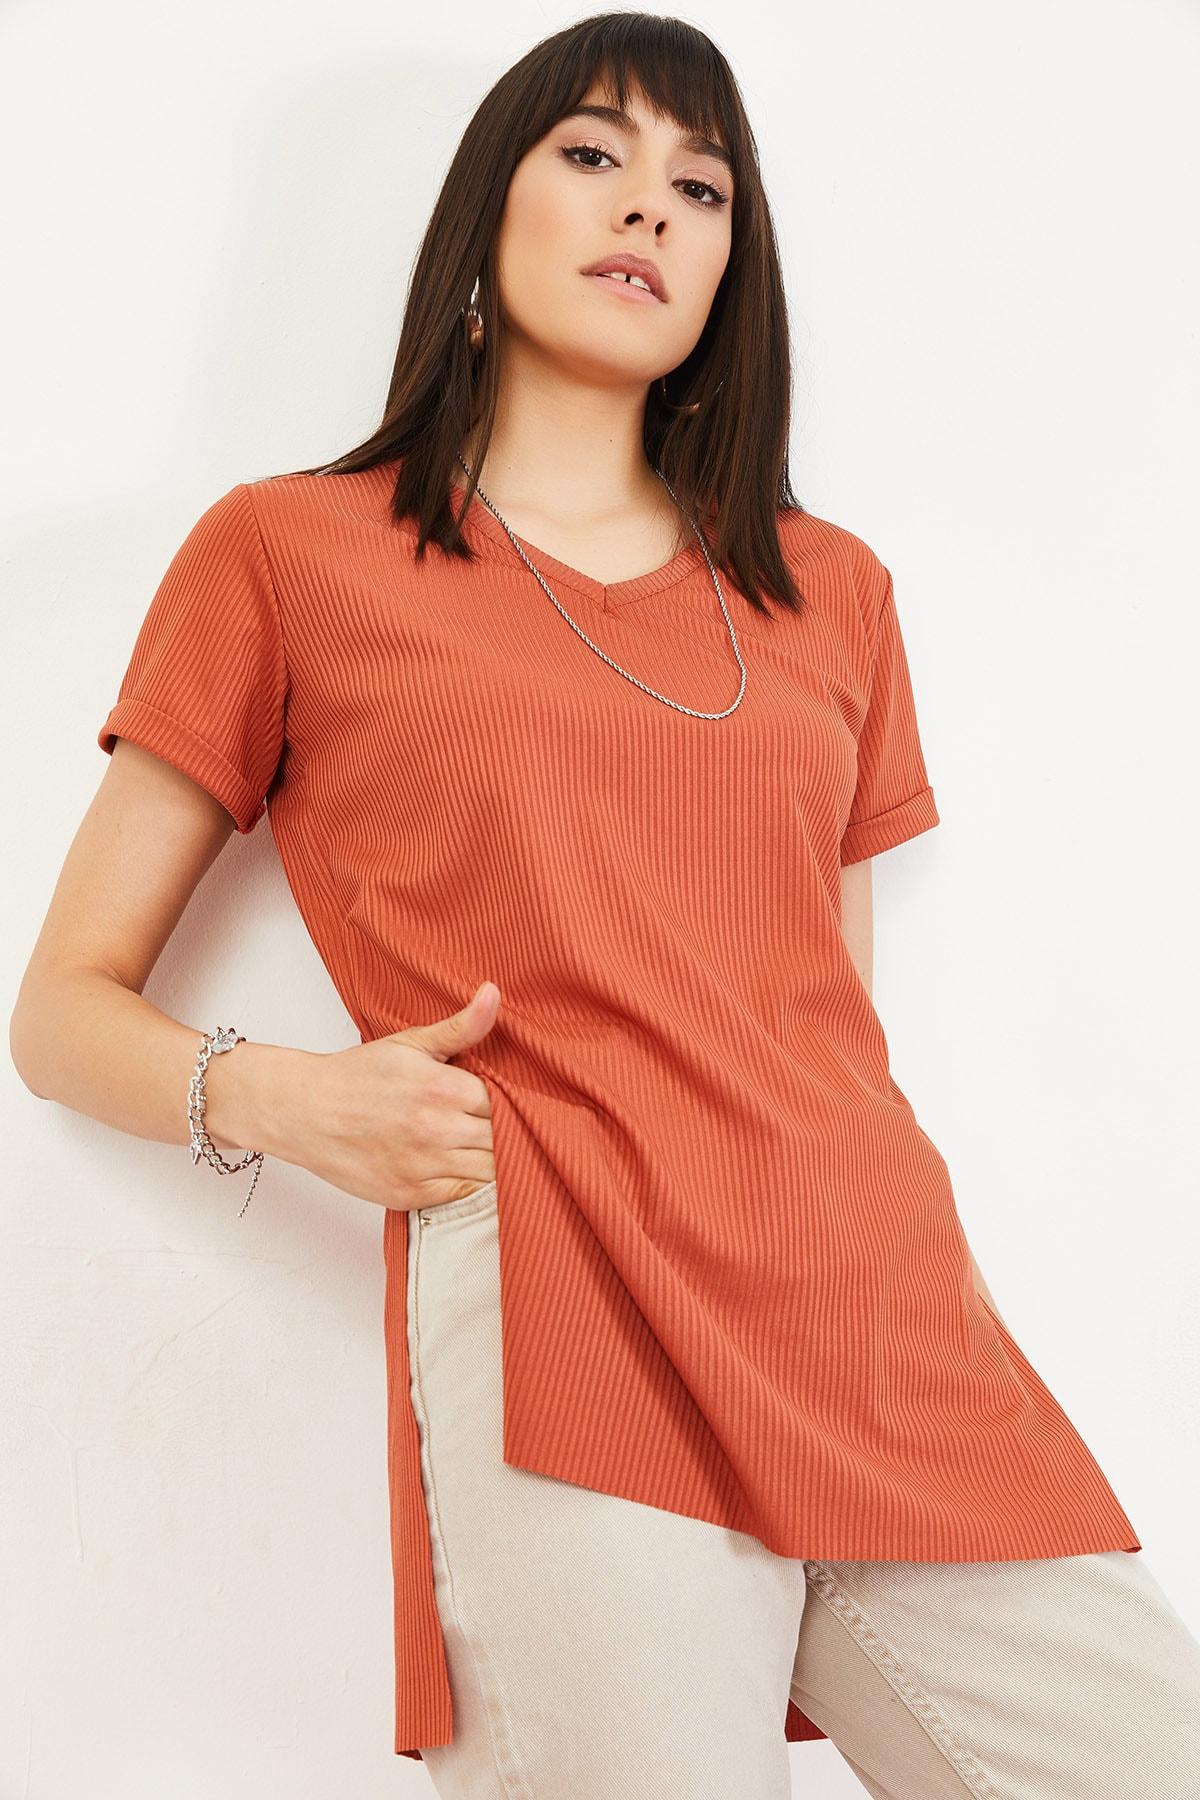 Bianco Lucci Kadın Kiremit Kol Yan Yırtmaçlı Kol Detay Kaşkorse T-Shirt 10051012